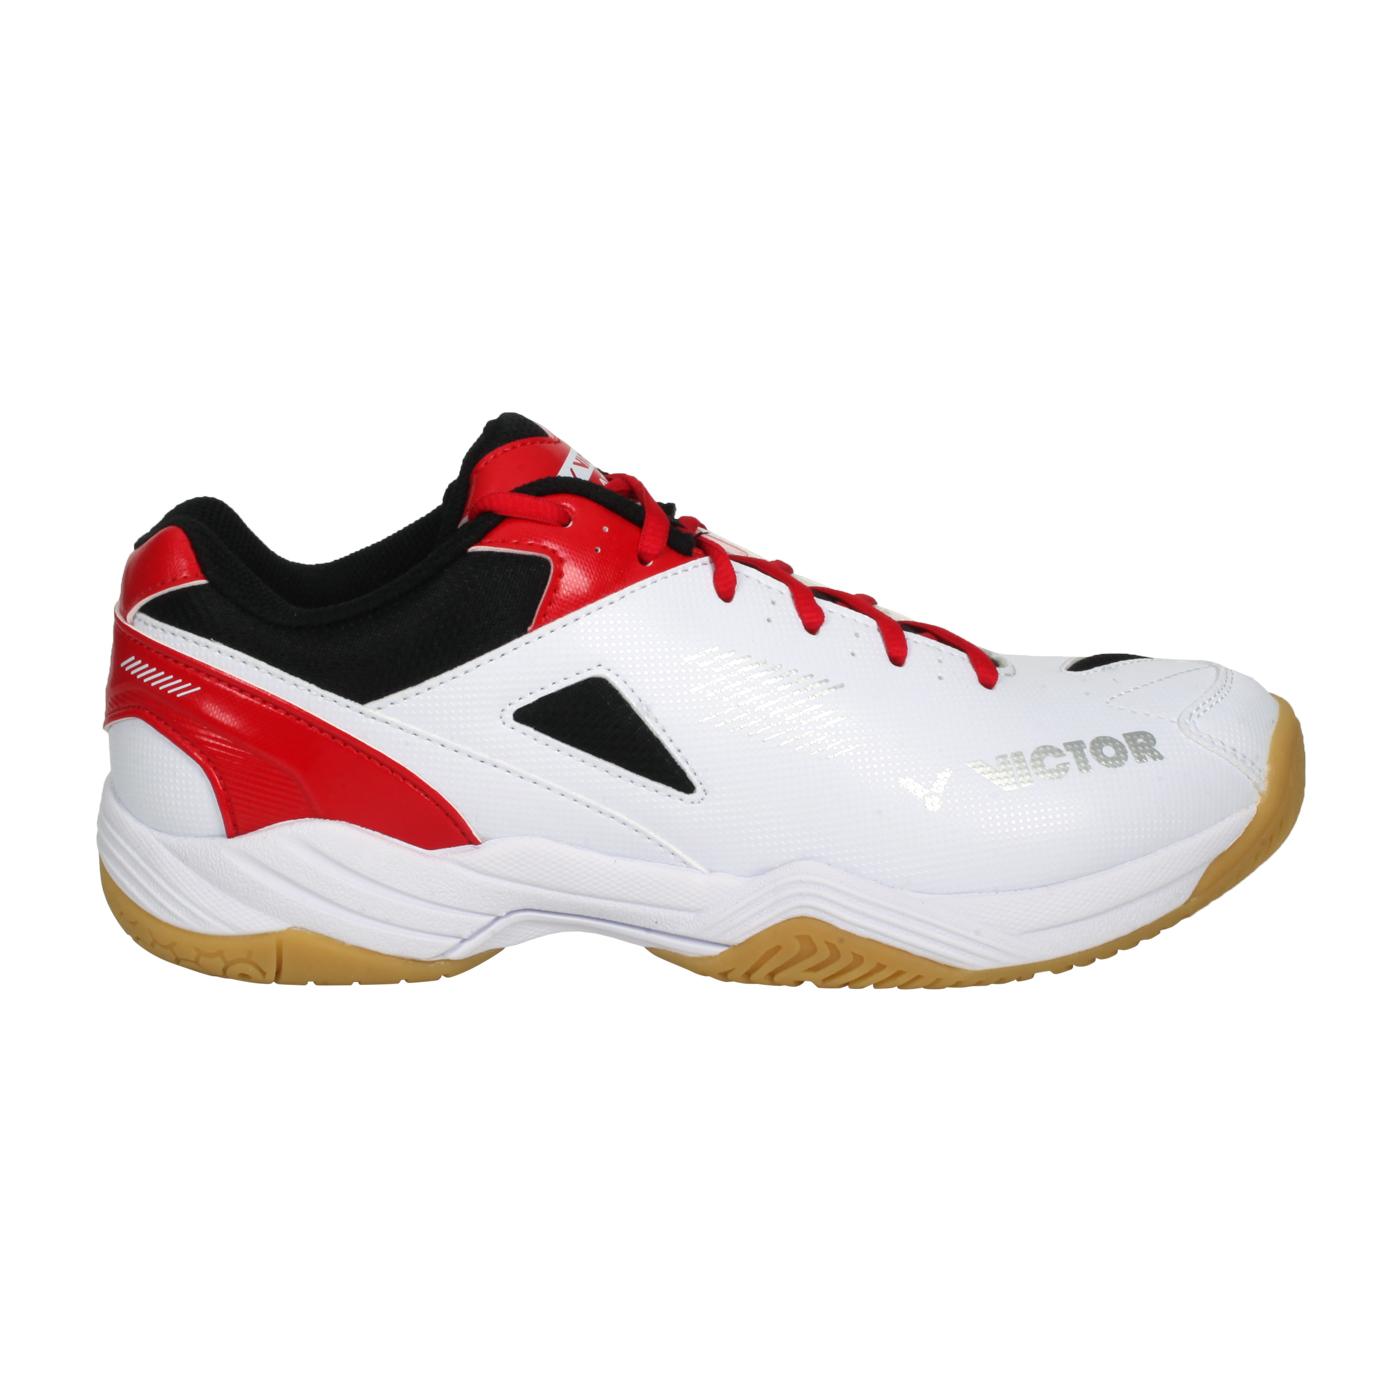 VICTOR 男女羽球鞋 A171-AD - 白黑紅